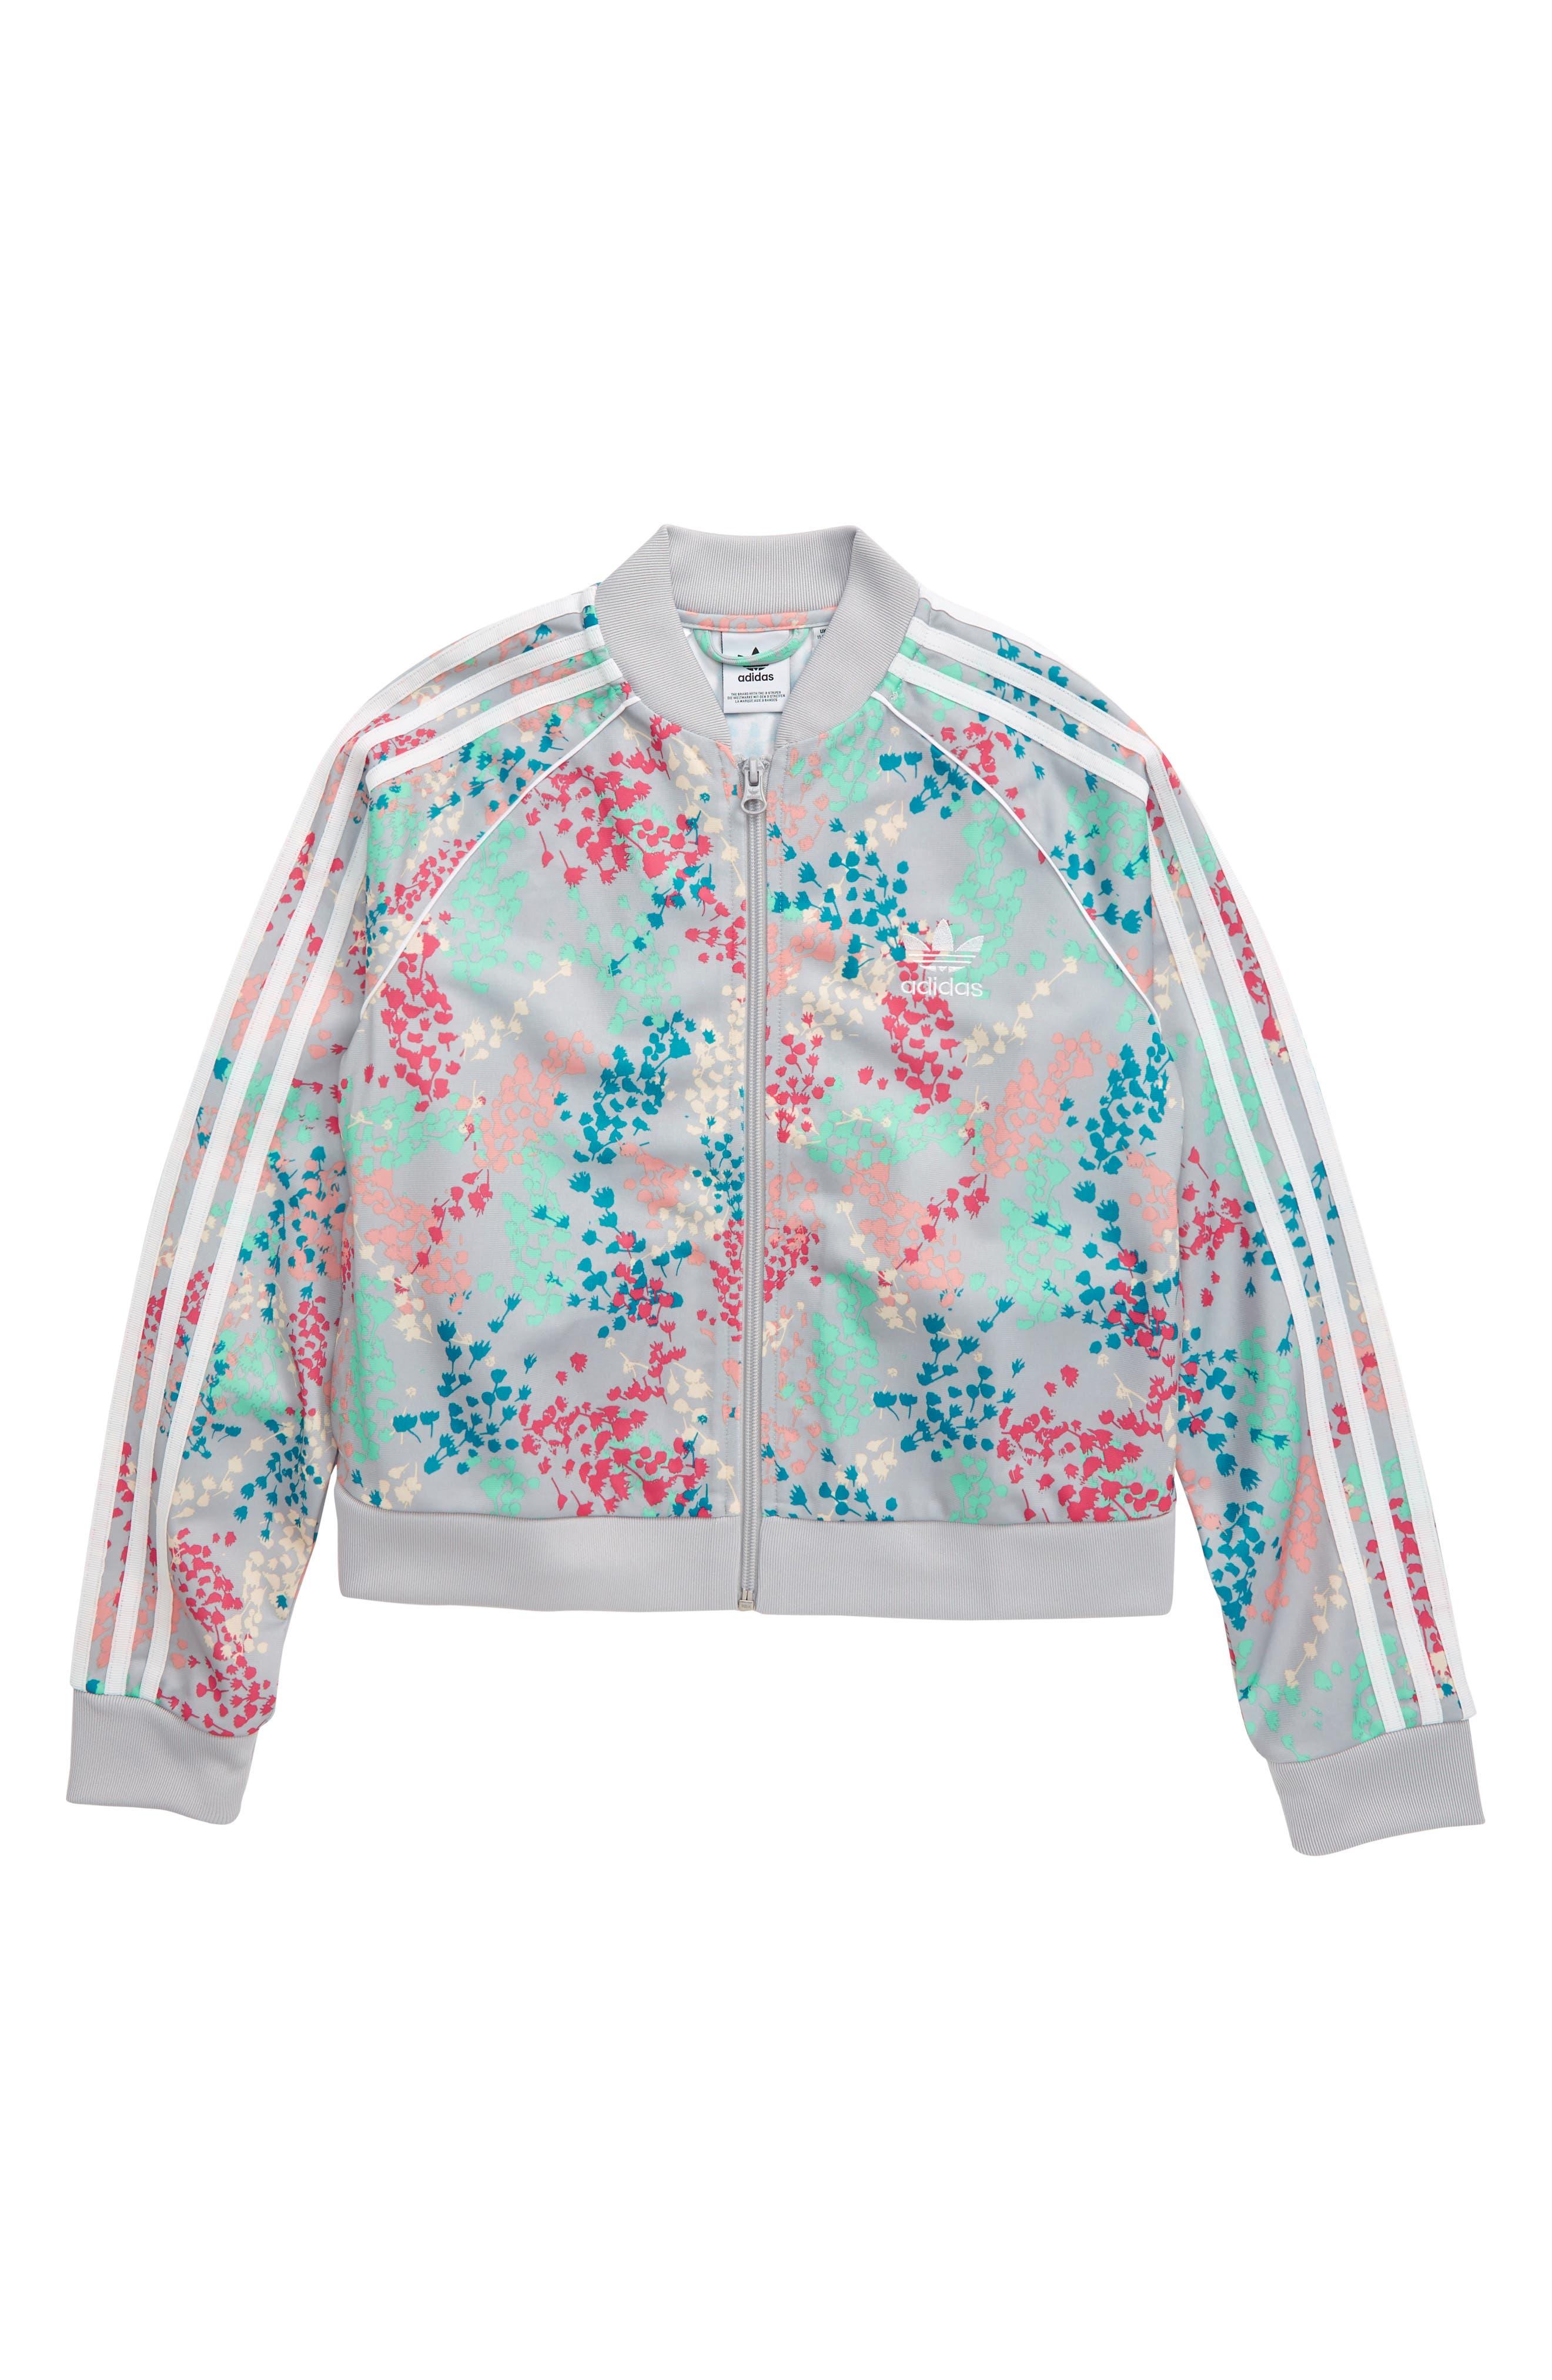 Girls Adidas Originals Sst Floral Print Crop Track Jacket Size M (1012)  Grey